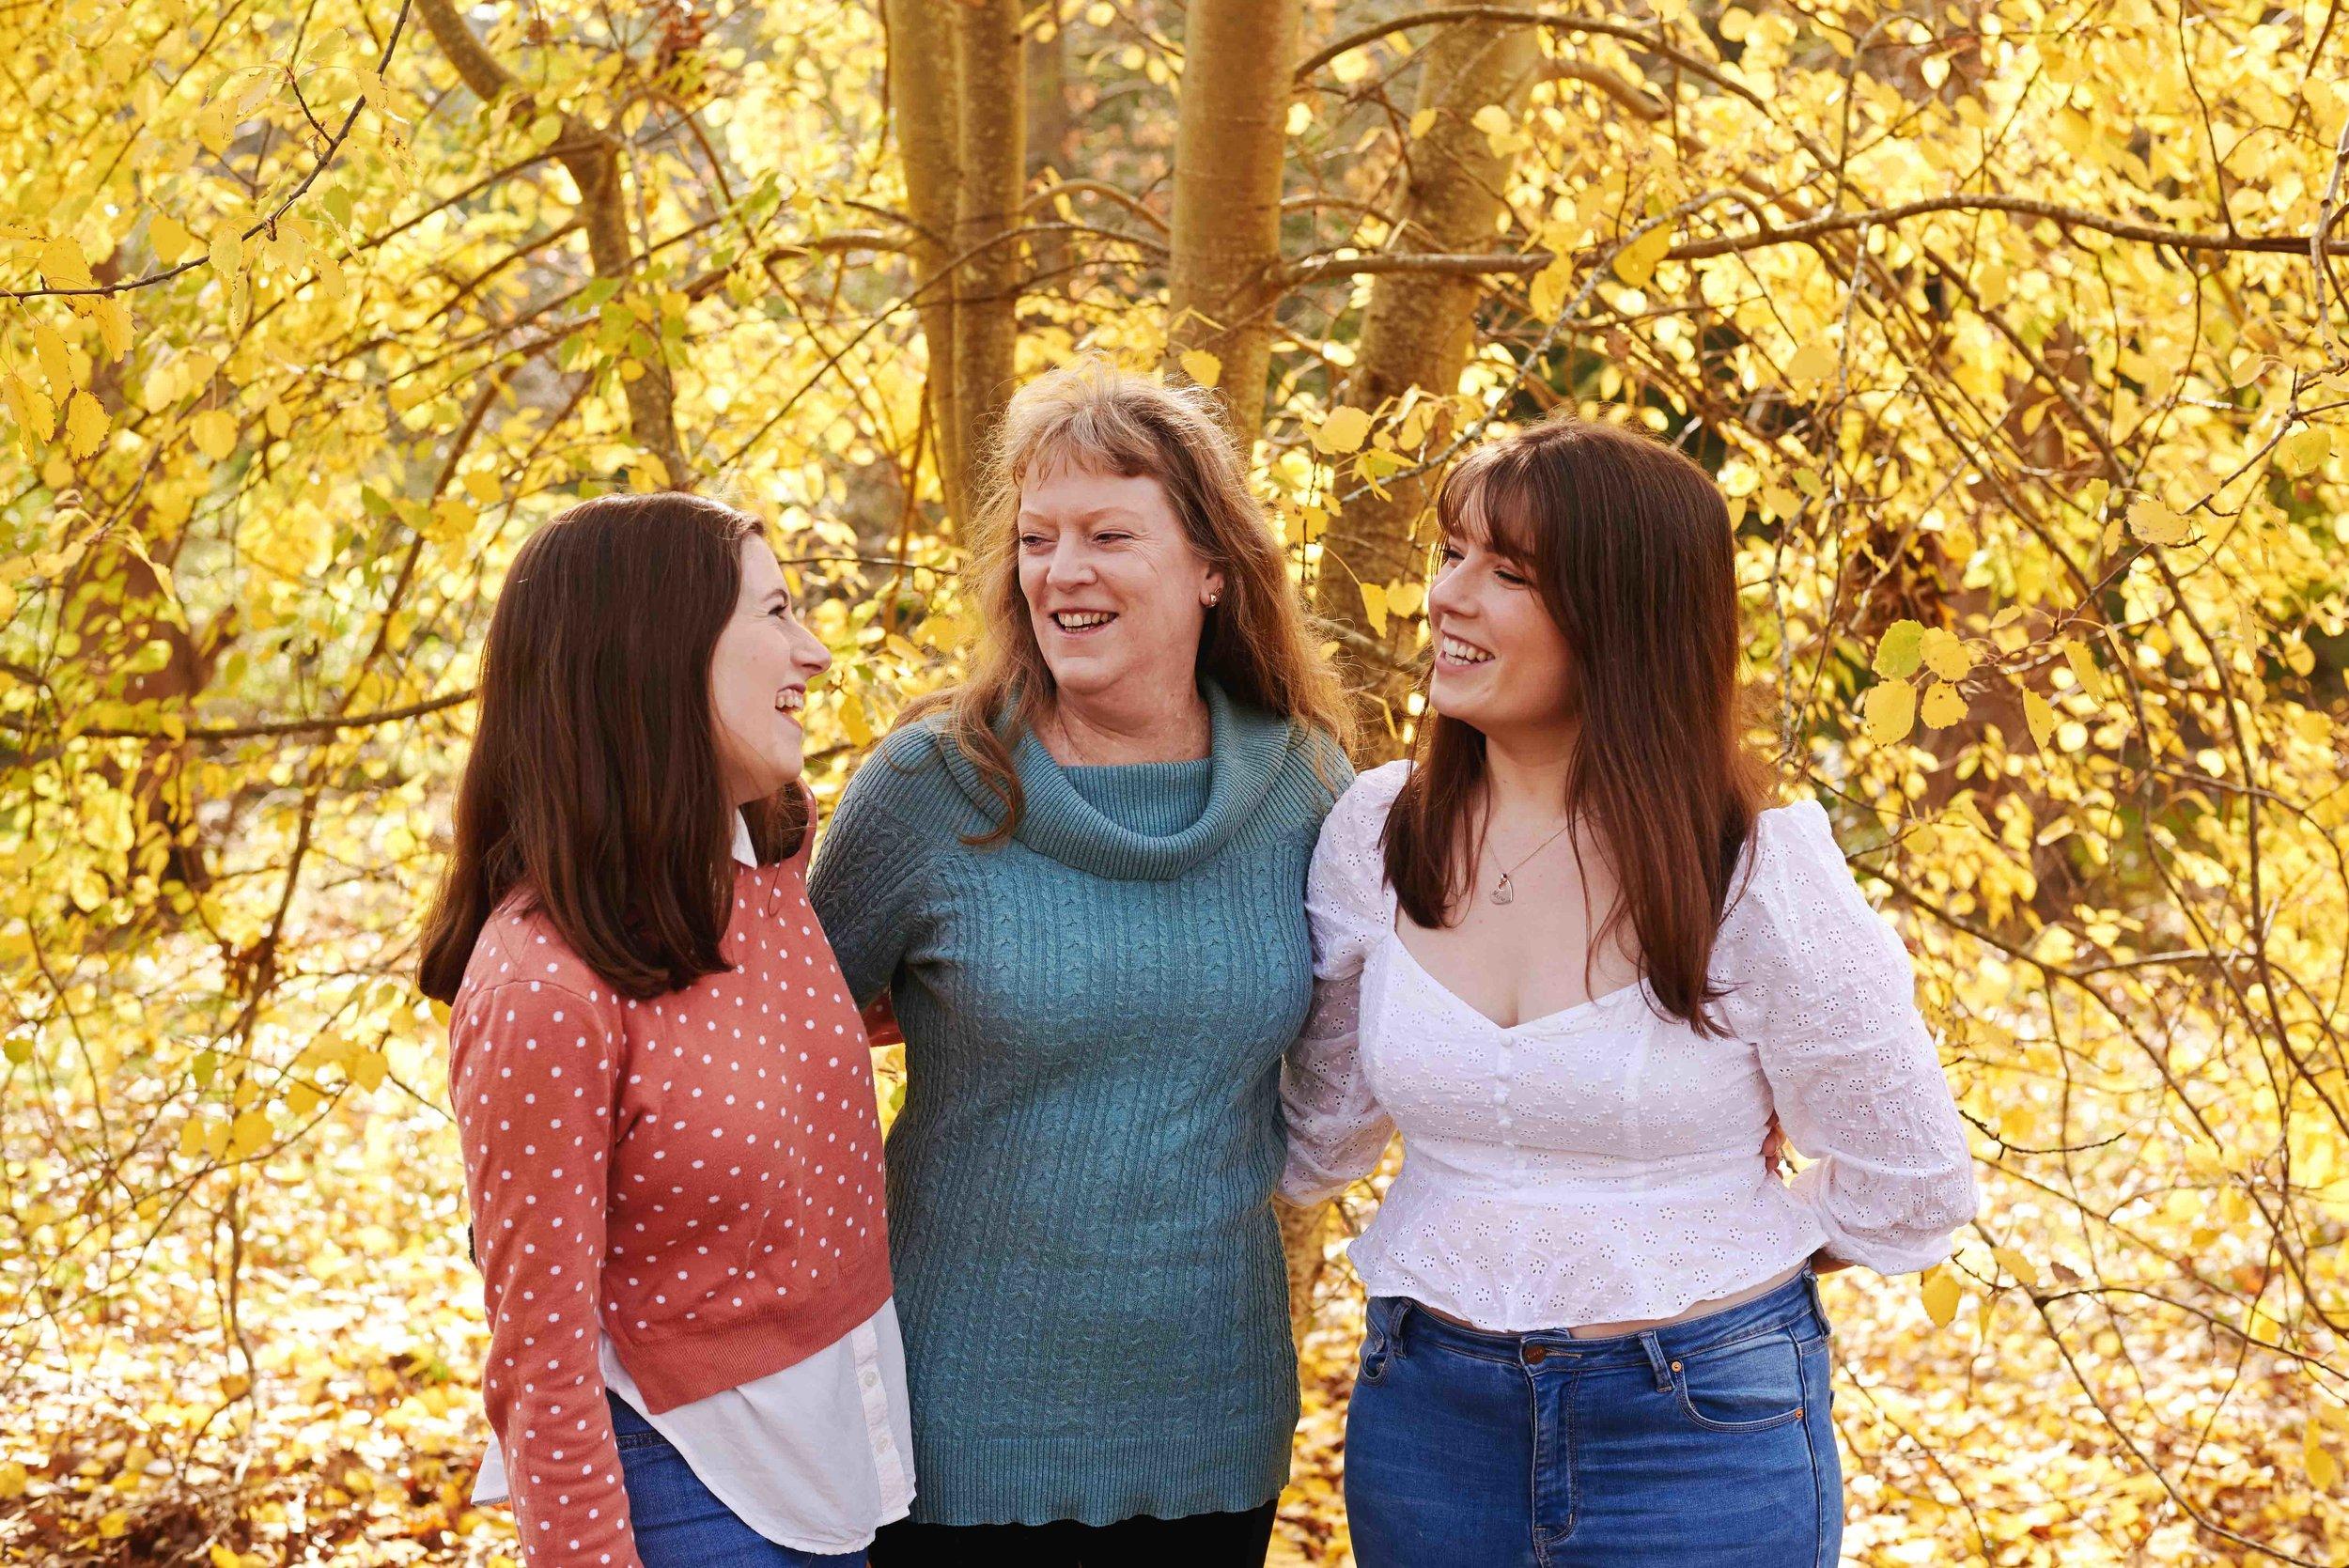 mornington-peninsula-family-photographer-marissa-jade-photography-families-red-hill-8.jpg